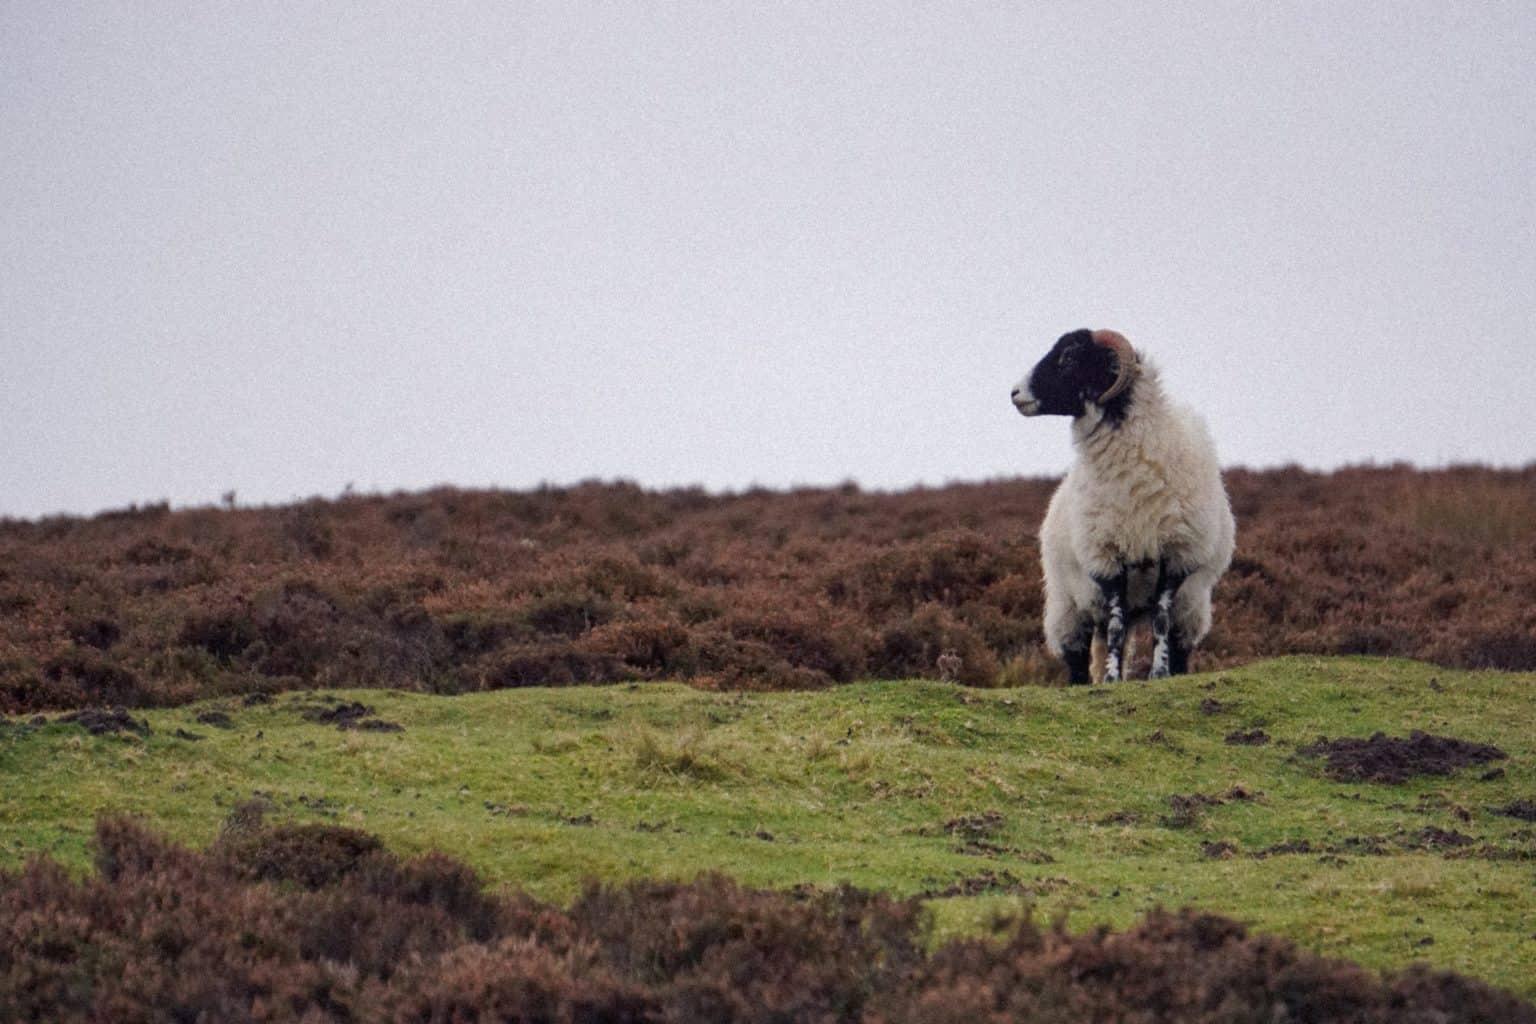 Wildlife at North York Moors Park